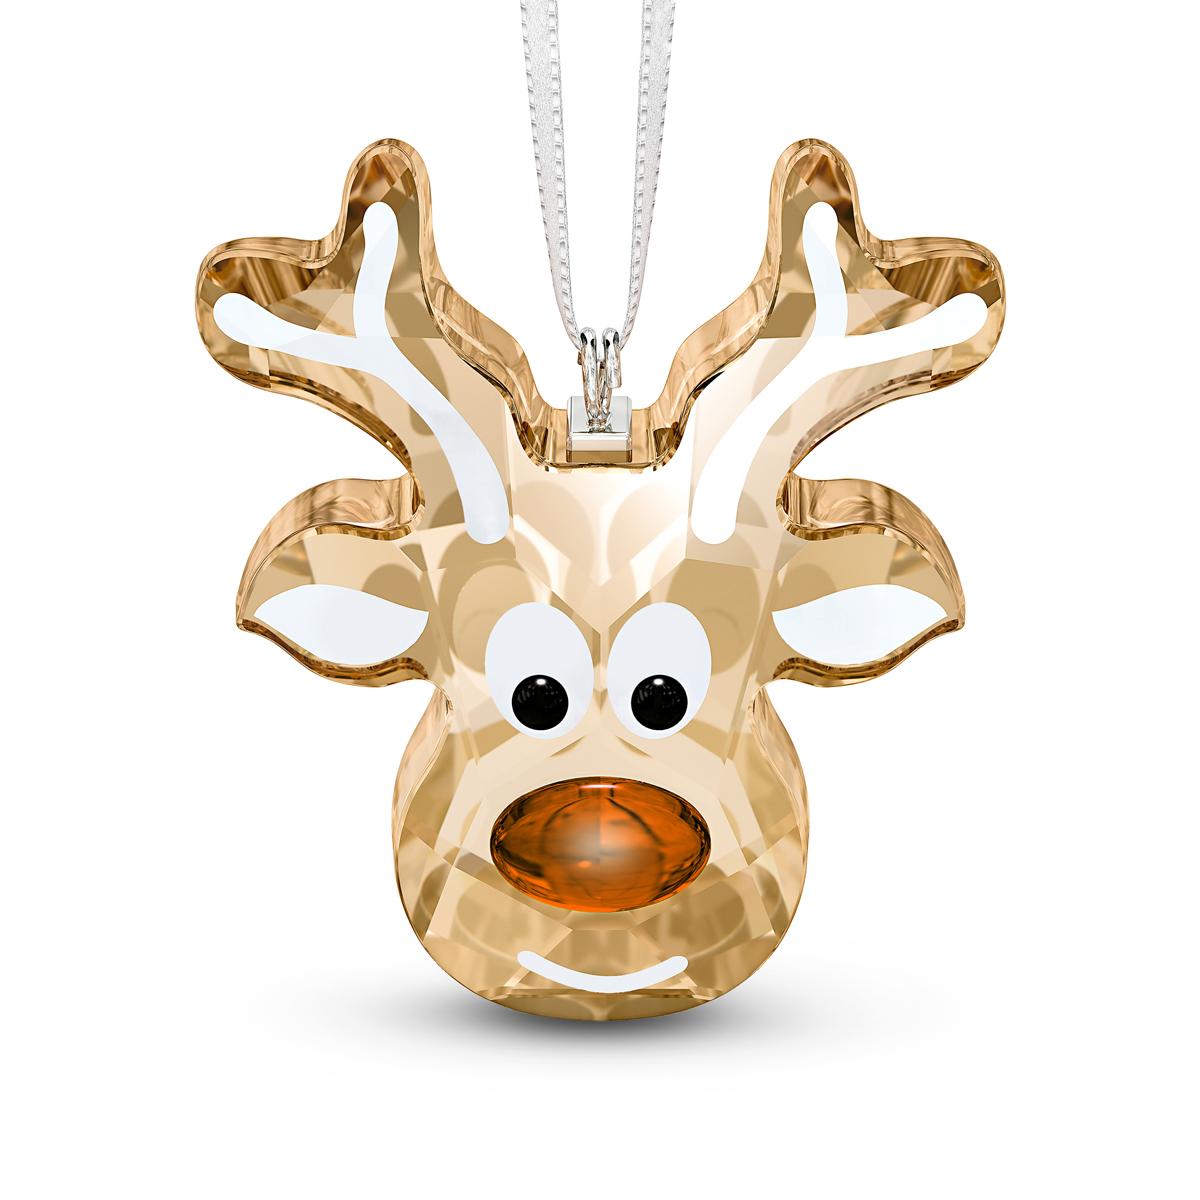 Swarovski 2020 Gingerbread Reindeer Ornament